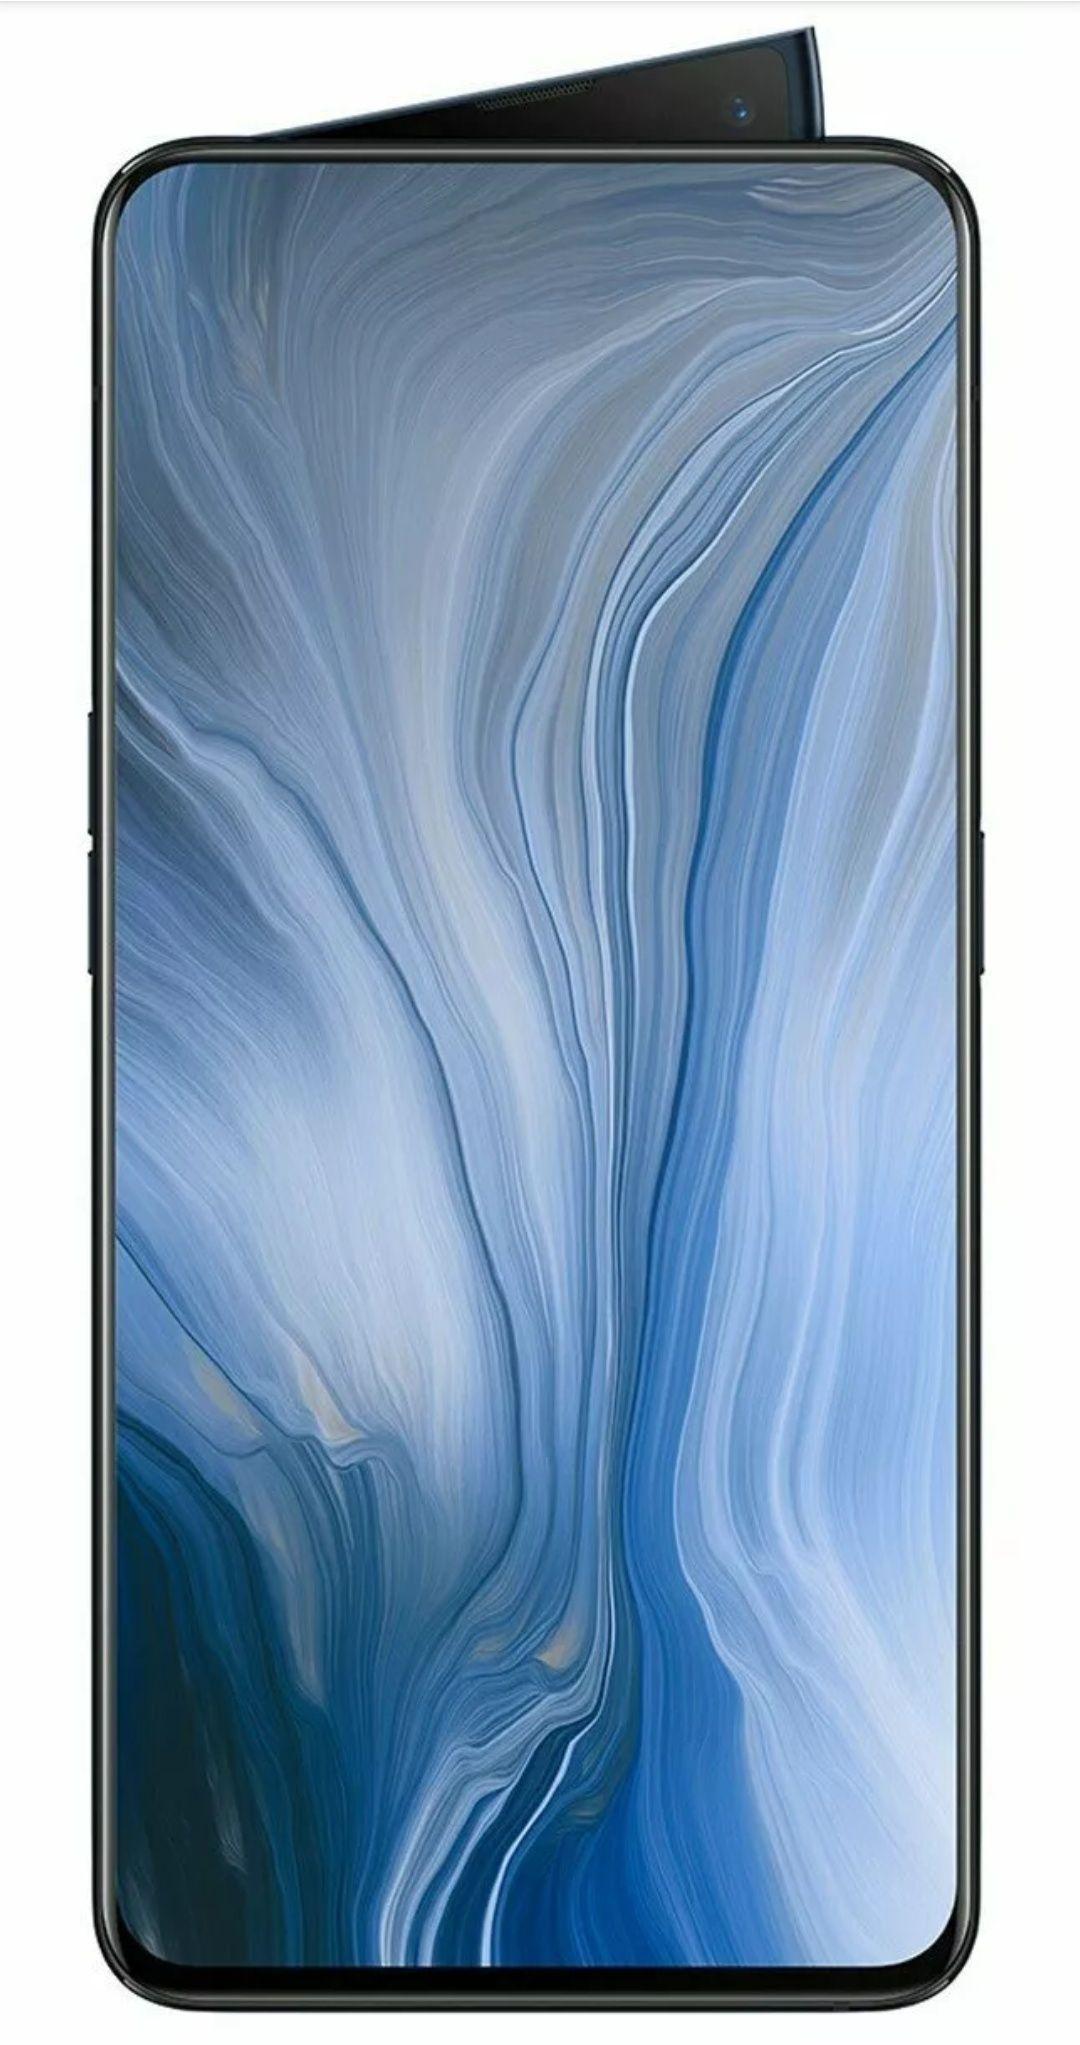 SIM Free OPPO Reno 6.4 Inch 256GB 48MP 4G Dual Sim Android Mobile Phone - Black £289.95 @ Argos Ebay